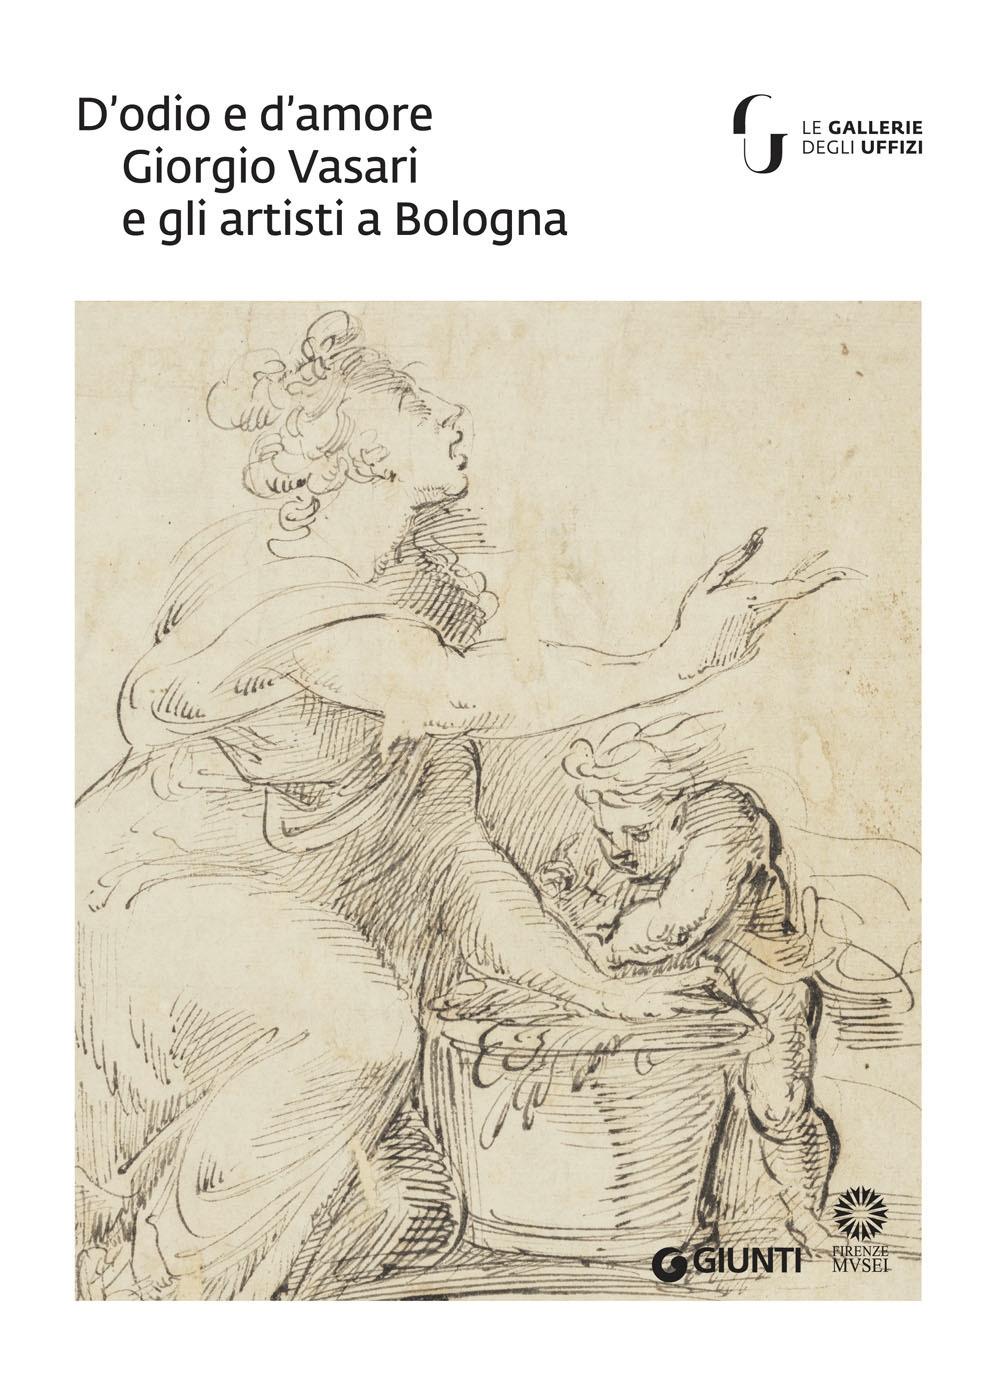 D'odio e d'amore. Giorgio Vasari e artisti a Bologna